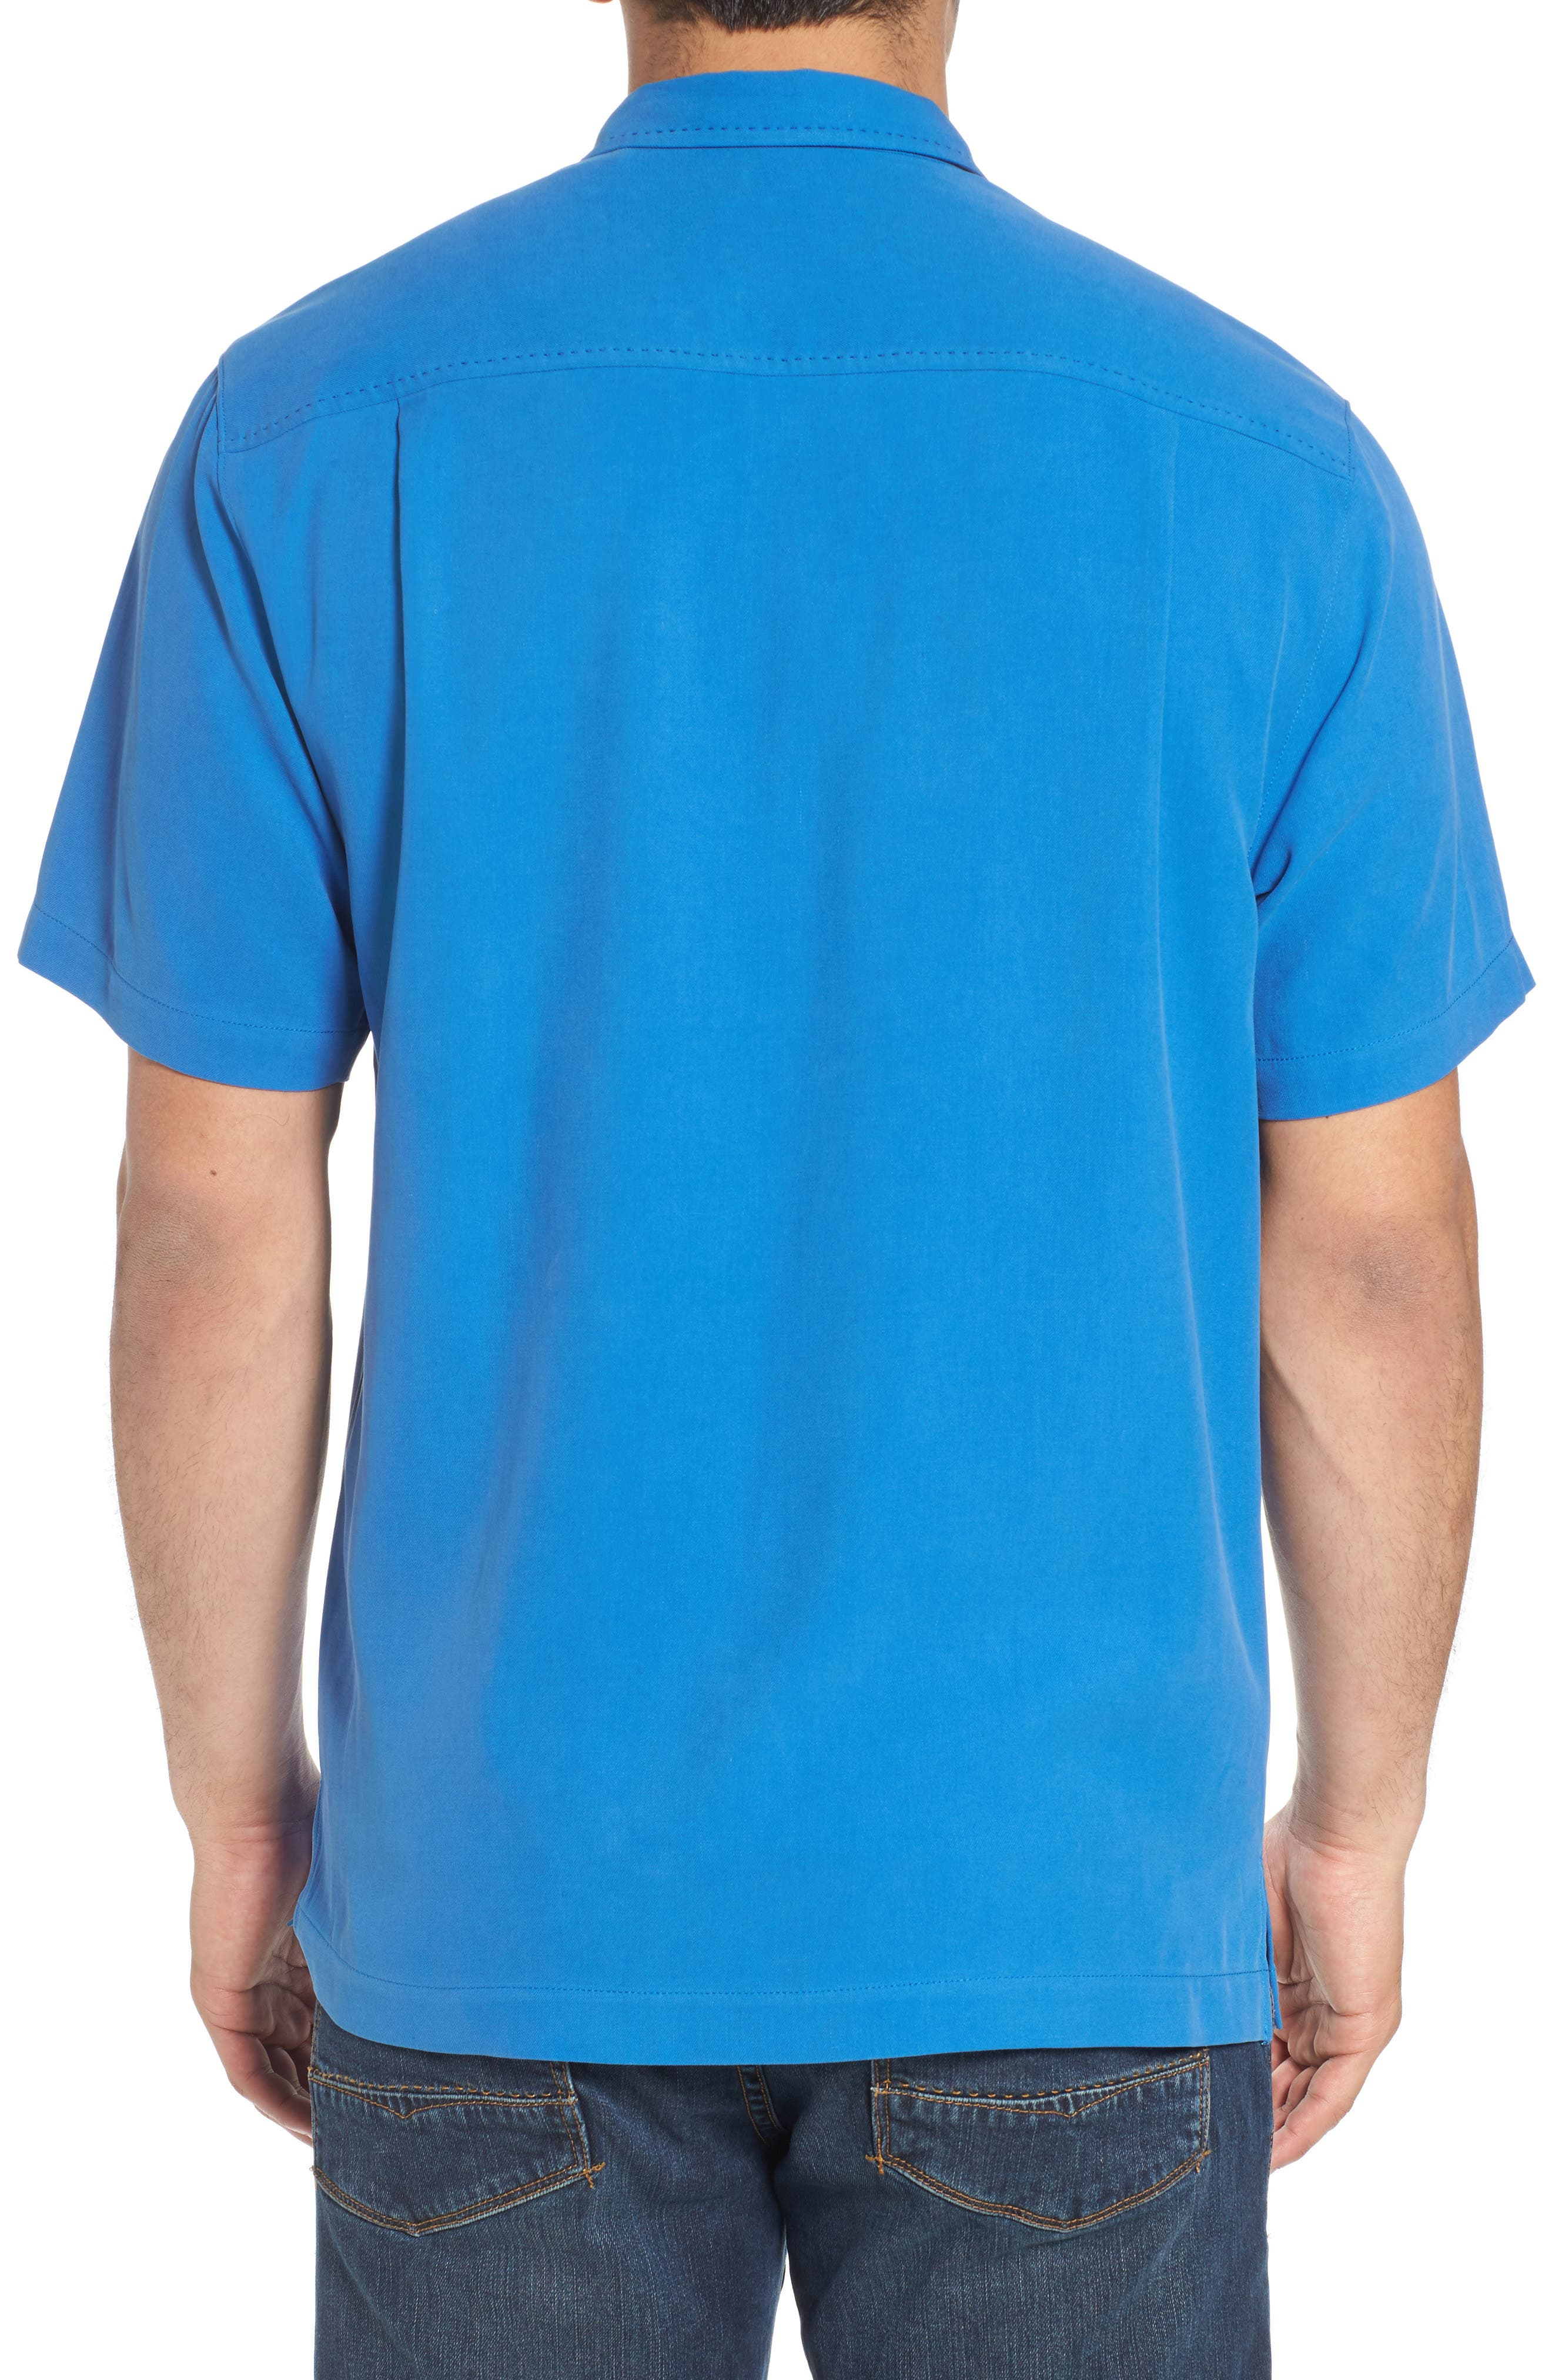 Catalina Twill Sport Shirt,                             Alternate thumbnail 2, color,                             NAVY